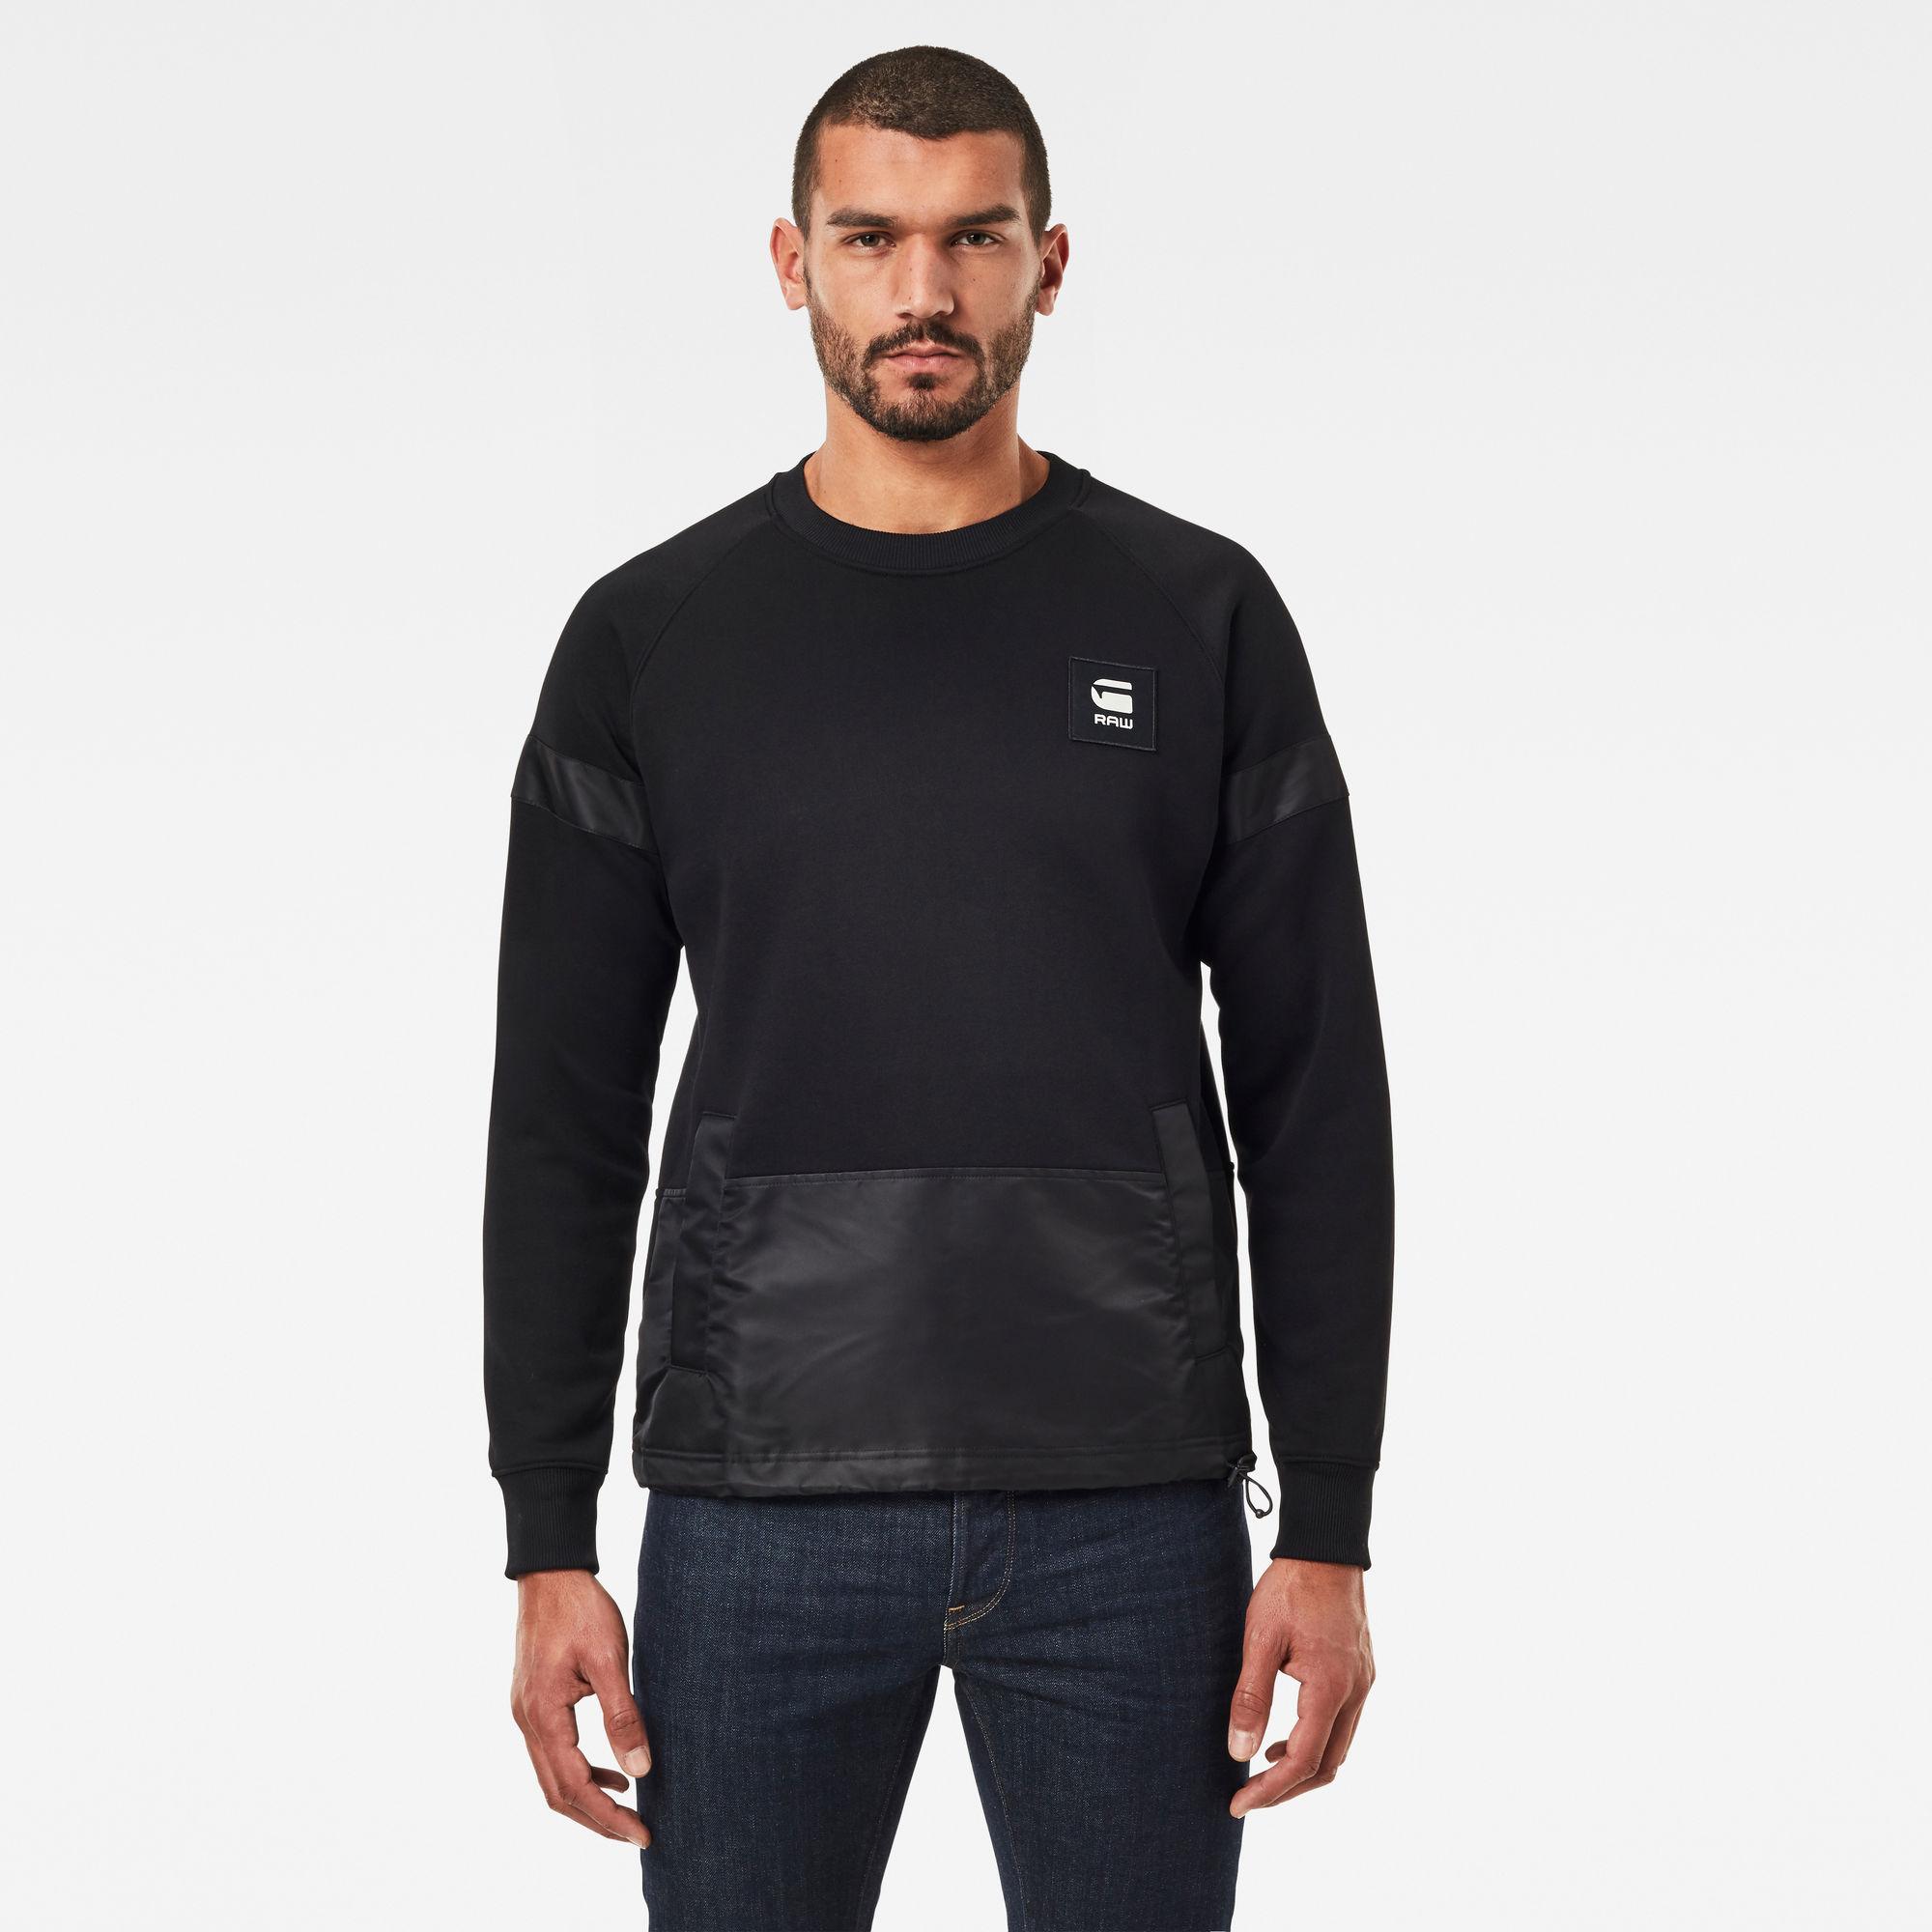 G-Star RAW Heren PM Sweater Zwart